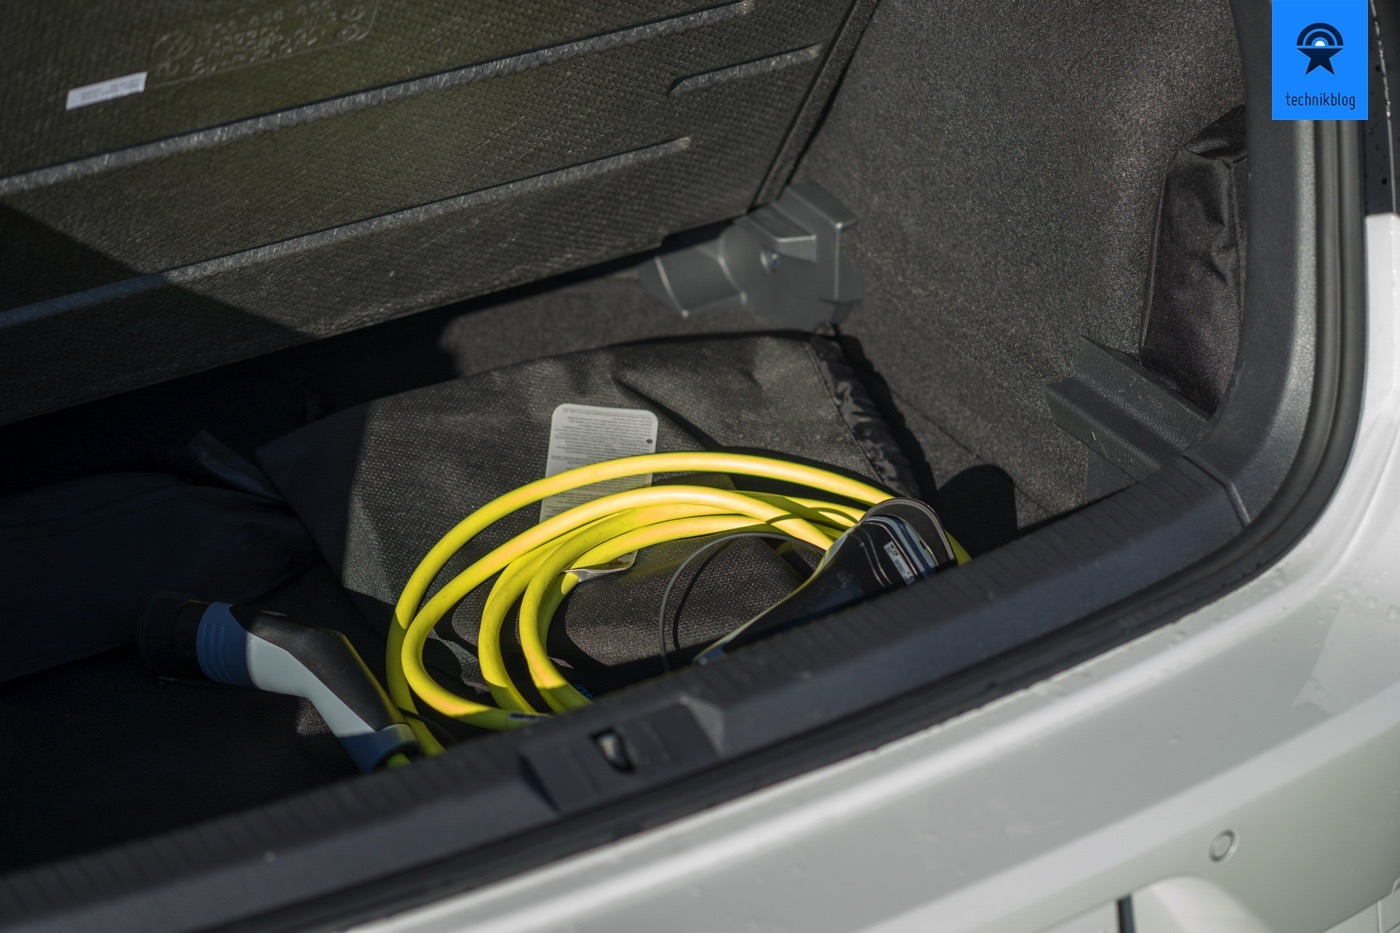 Ladekabel im doppelten Boden des e-Golf Kofferraums